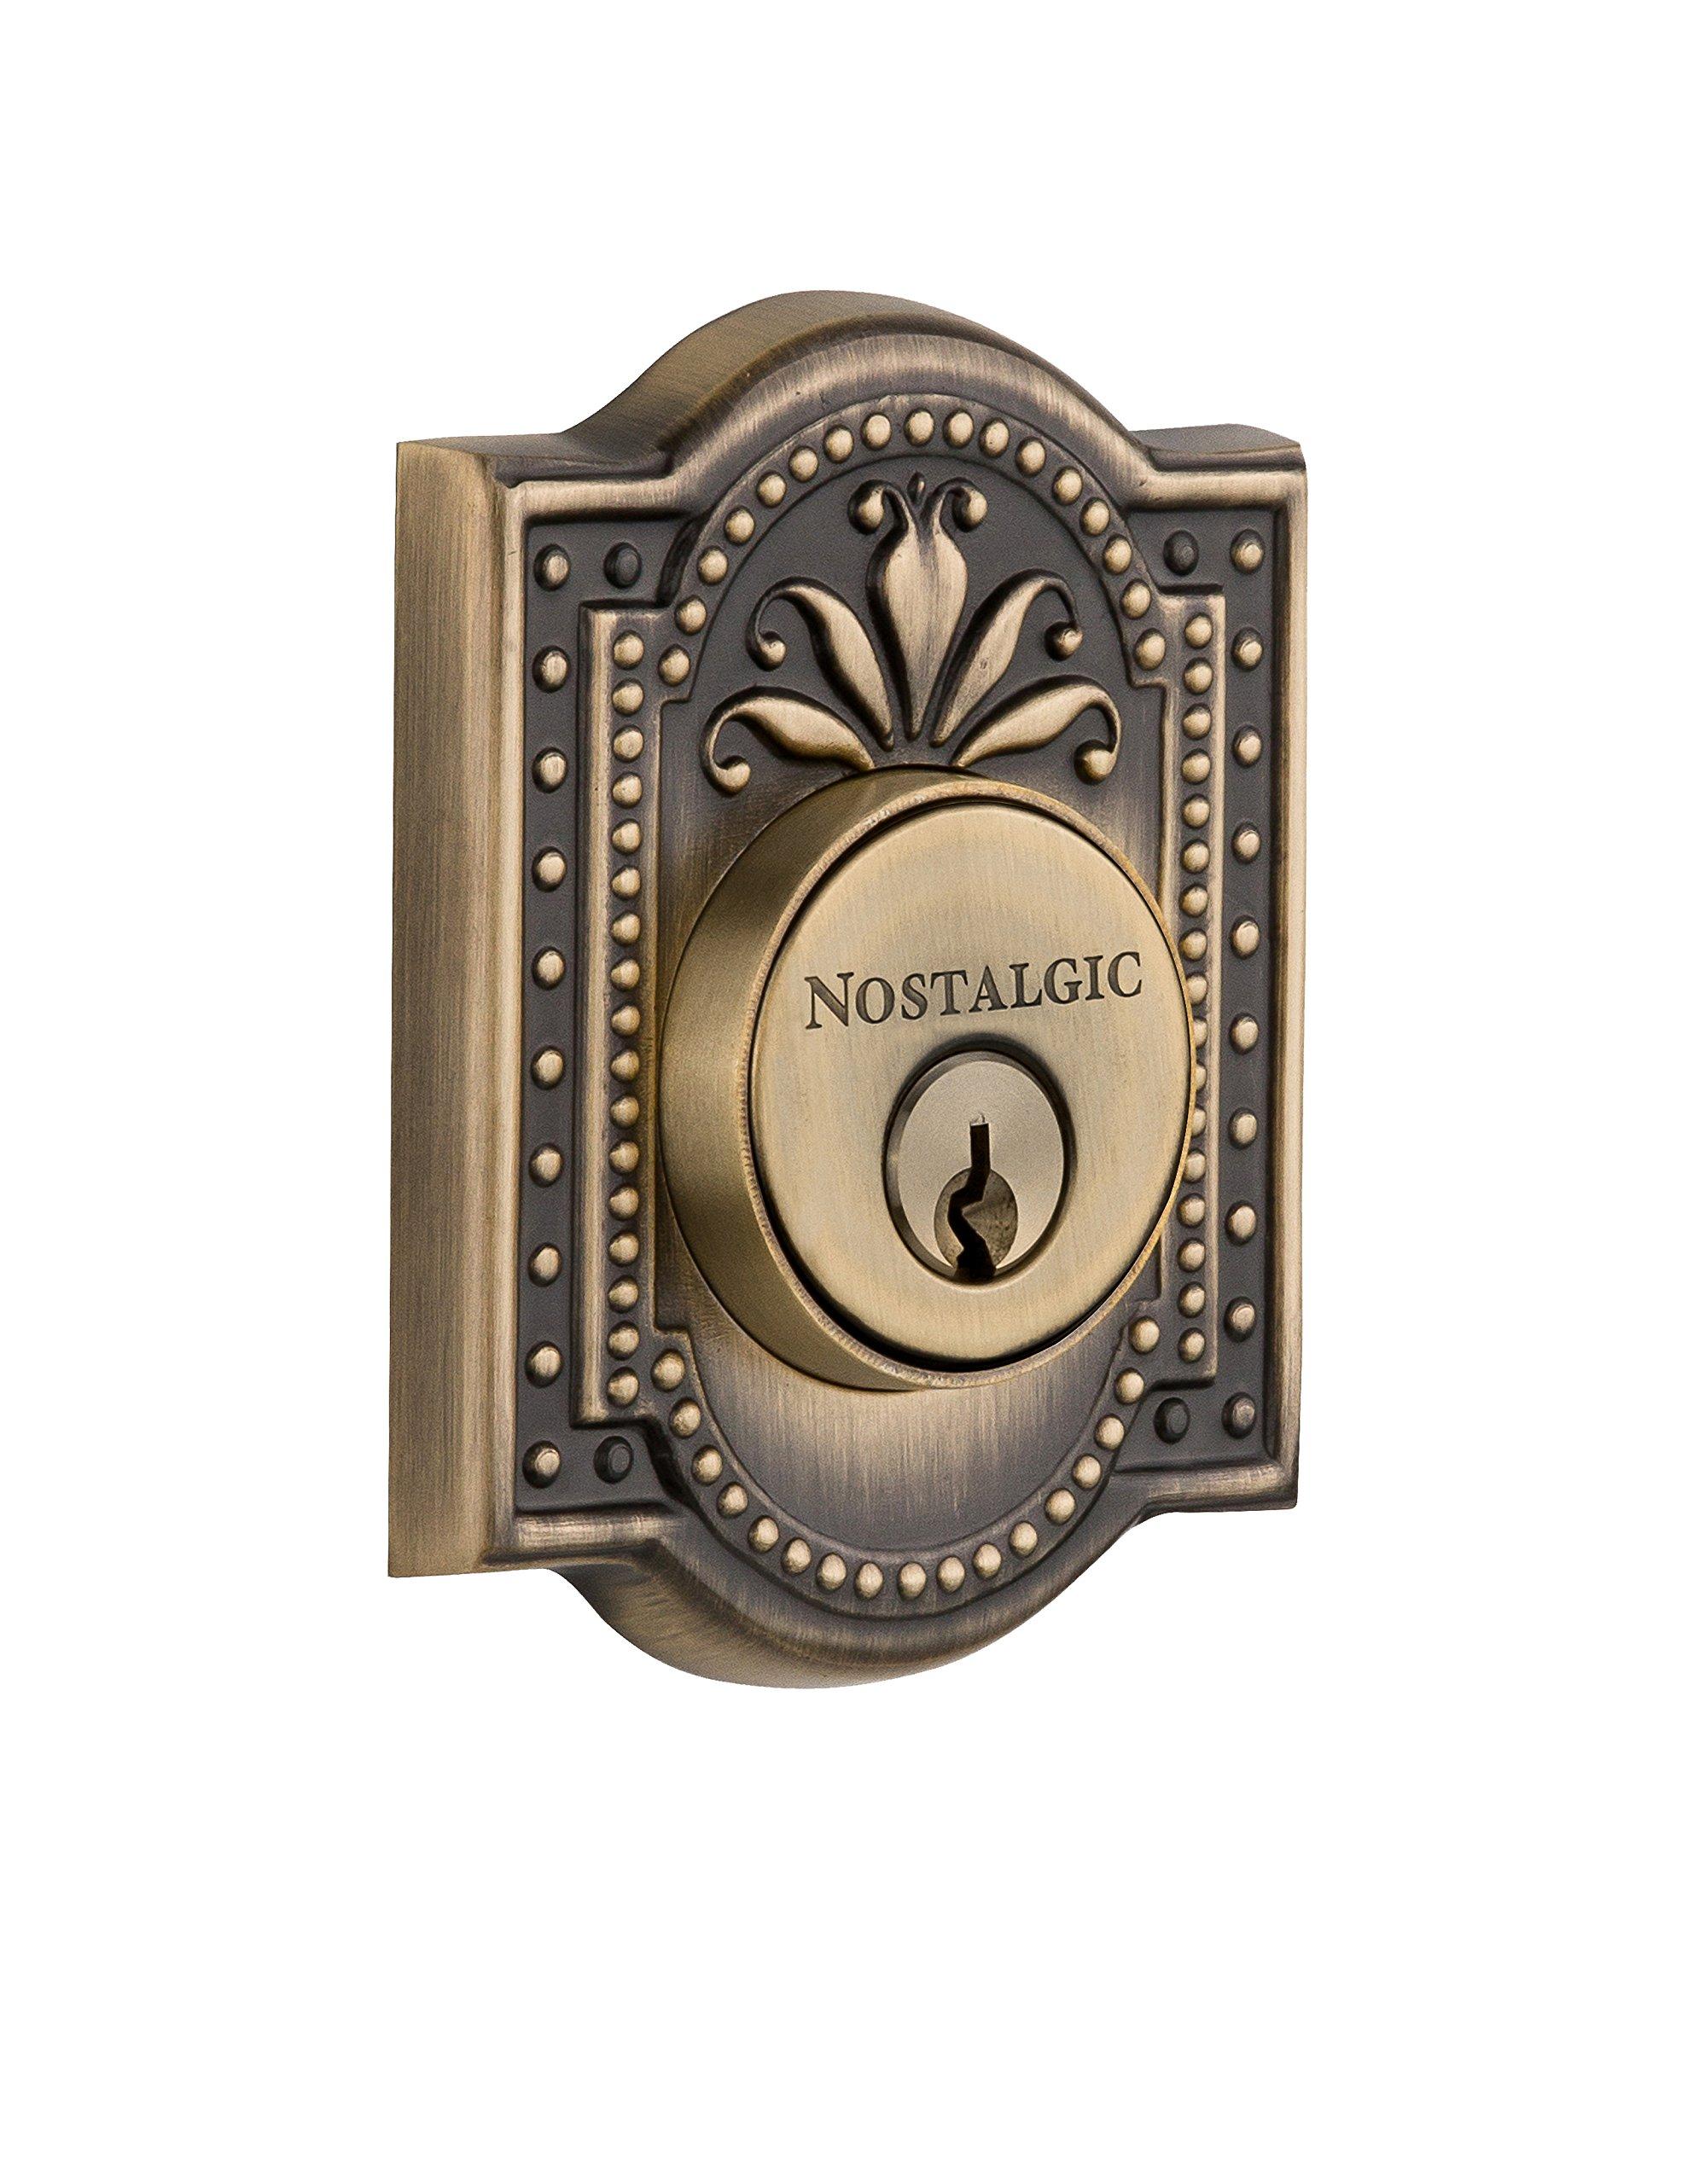 Nostalgic Warehouse 733026 Meadows Plate Double Cylinder Deadbolt Meadows Door Knob, Antique Brass